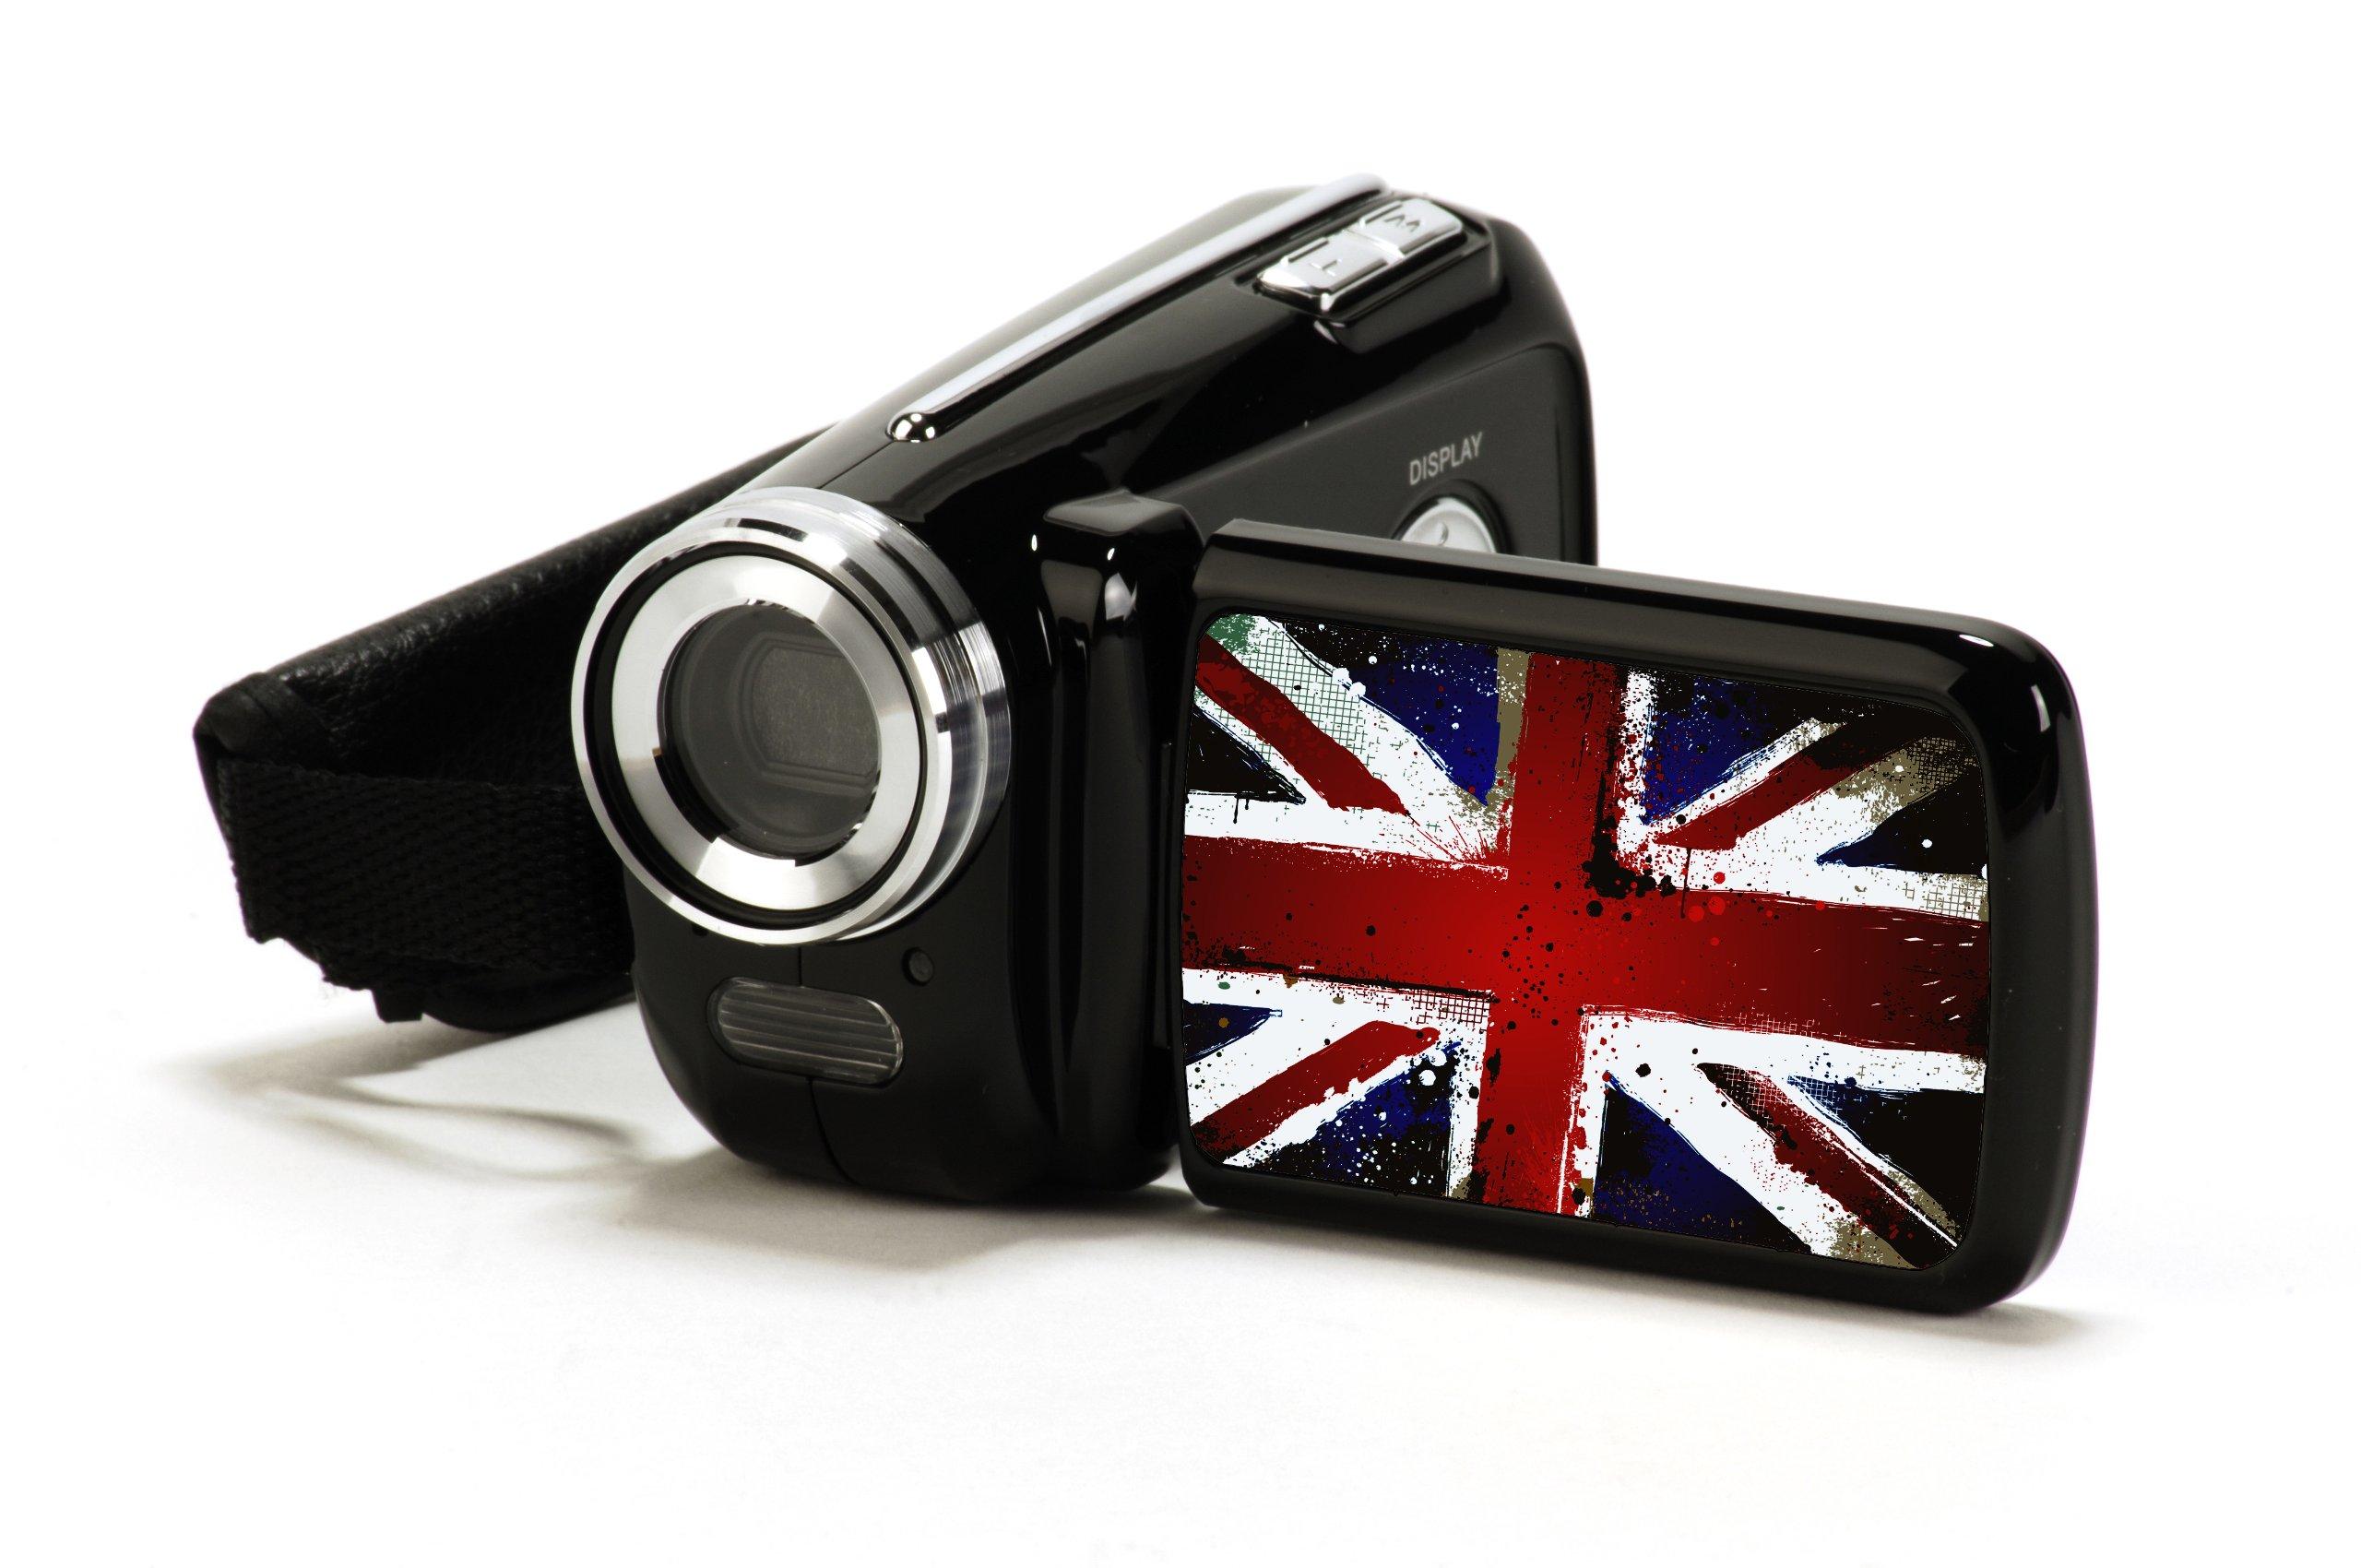 Teknofun Old UK Digital Video Camera (5 MP) by TEKNOFUN